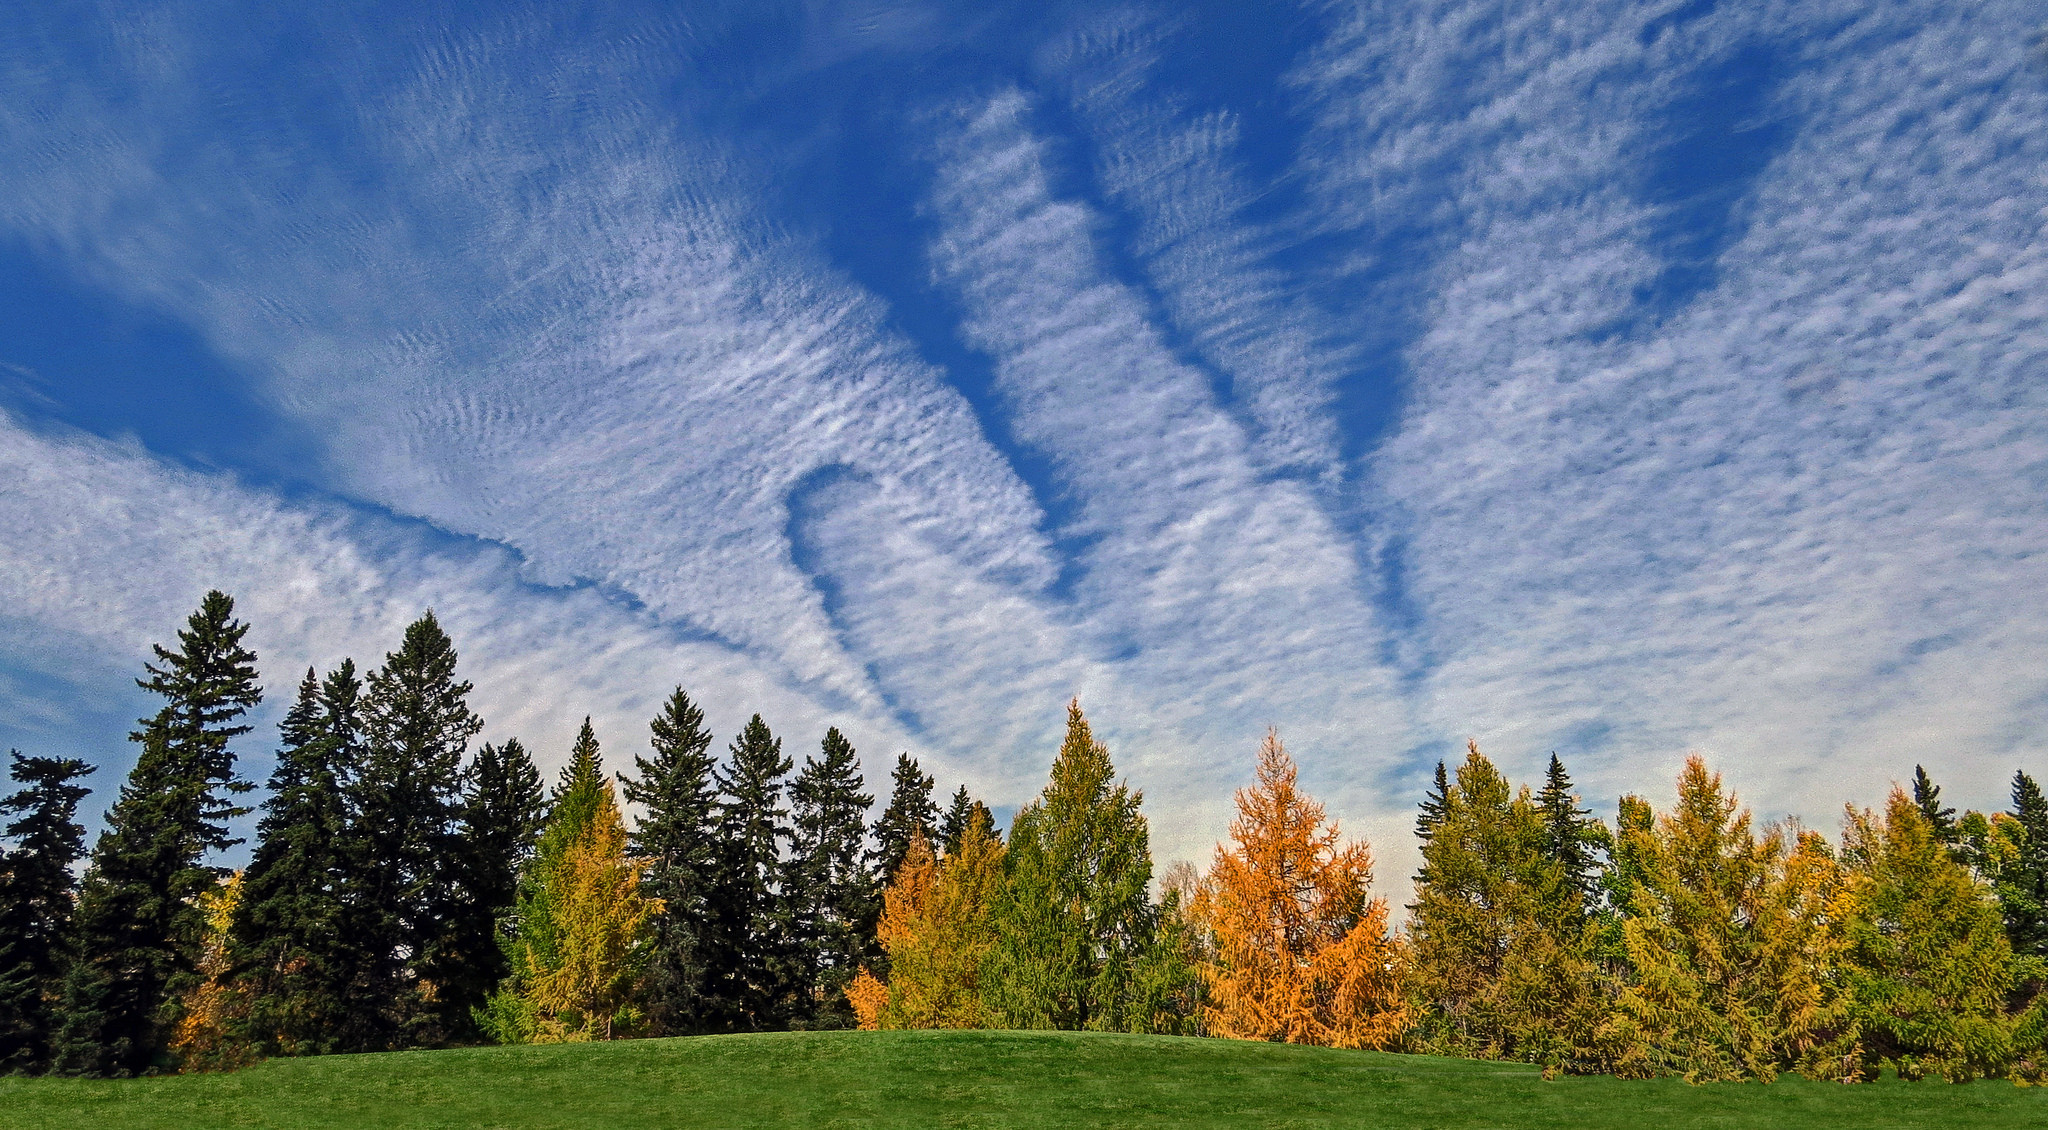 обои осень, холм, деревья, небо картинки фото